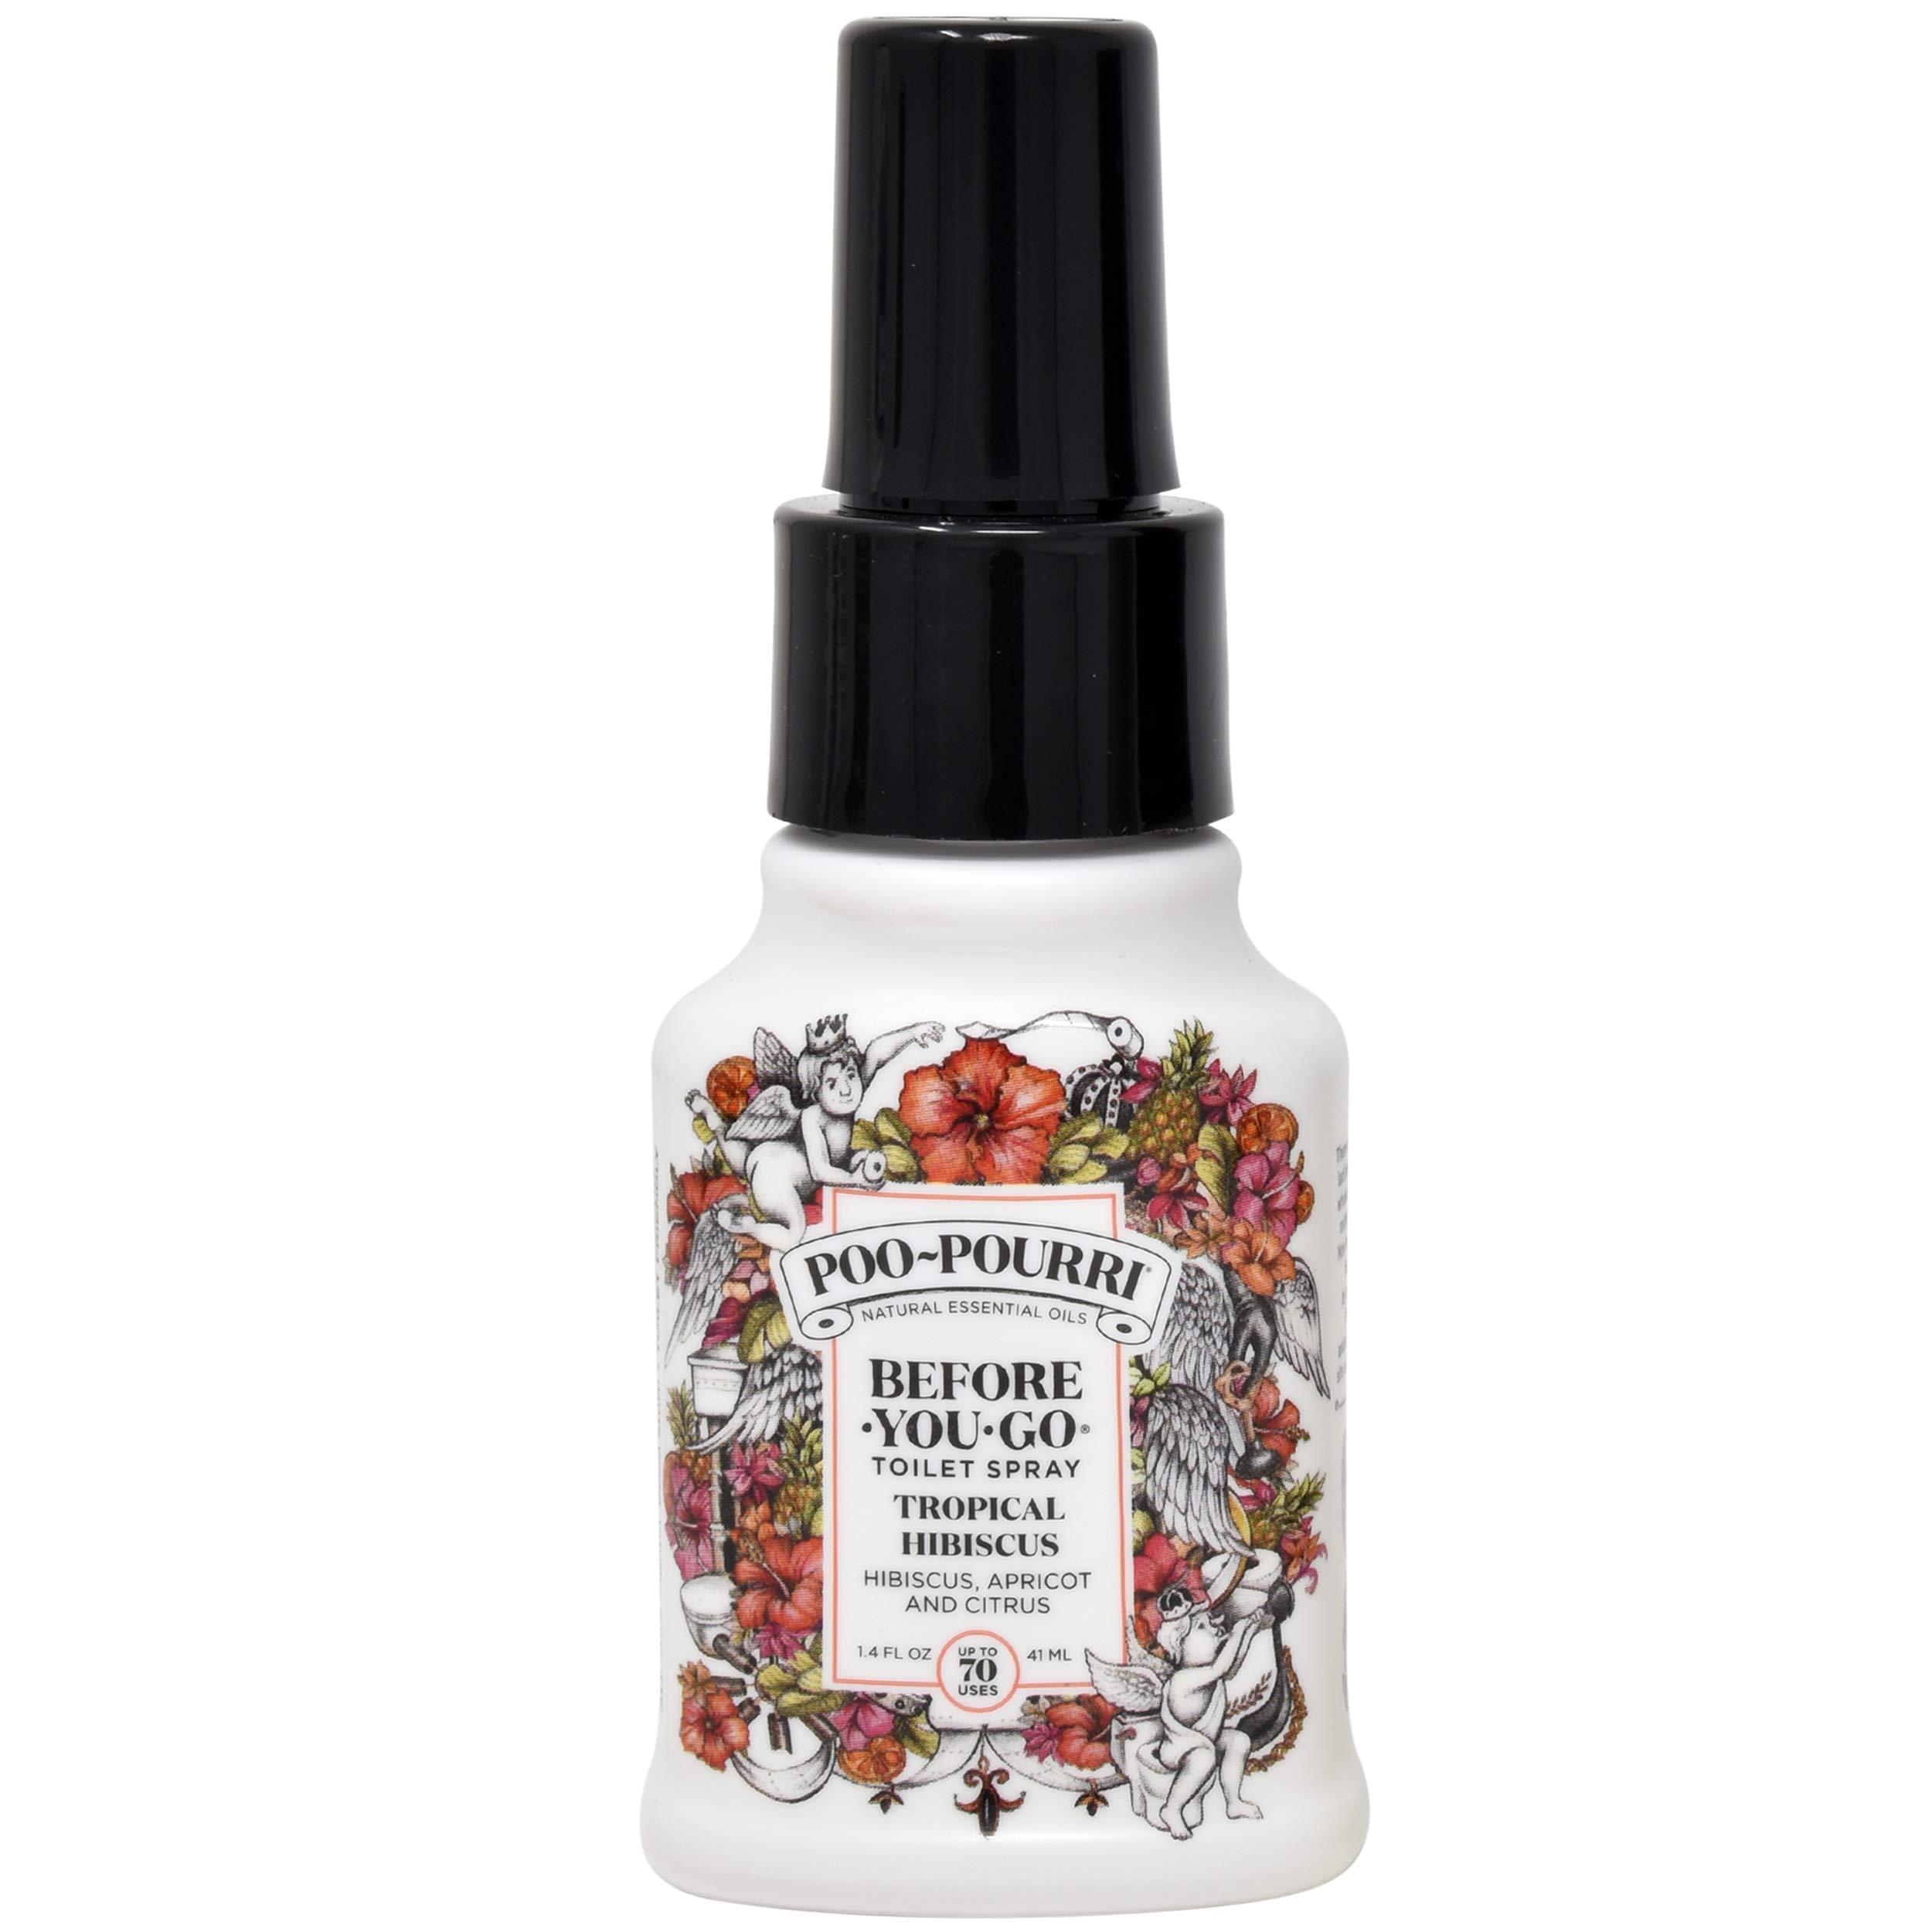 Poo-Pourri Vanilla Mint 4 Ounce, Tropical Hibiscus 1.4 Ounce and Original Citrus 1.4 Ounce by Poo-Pourri (Image #3)